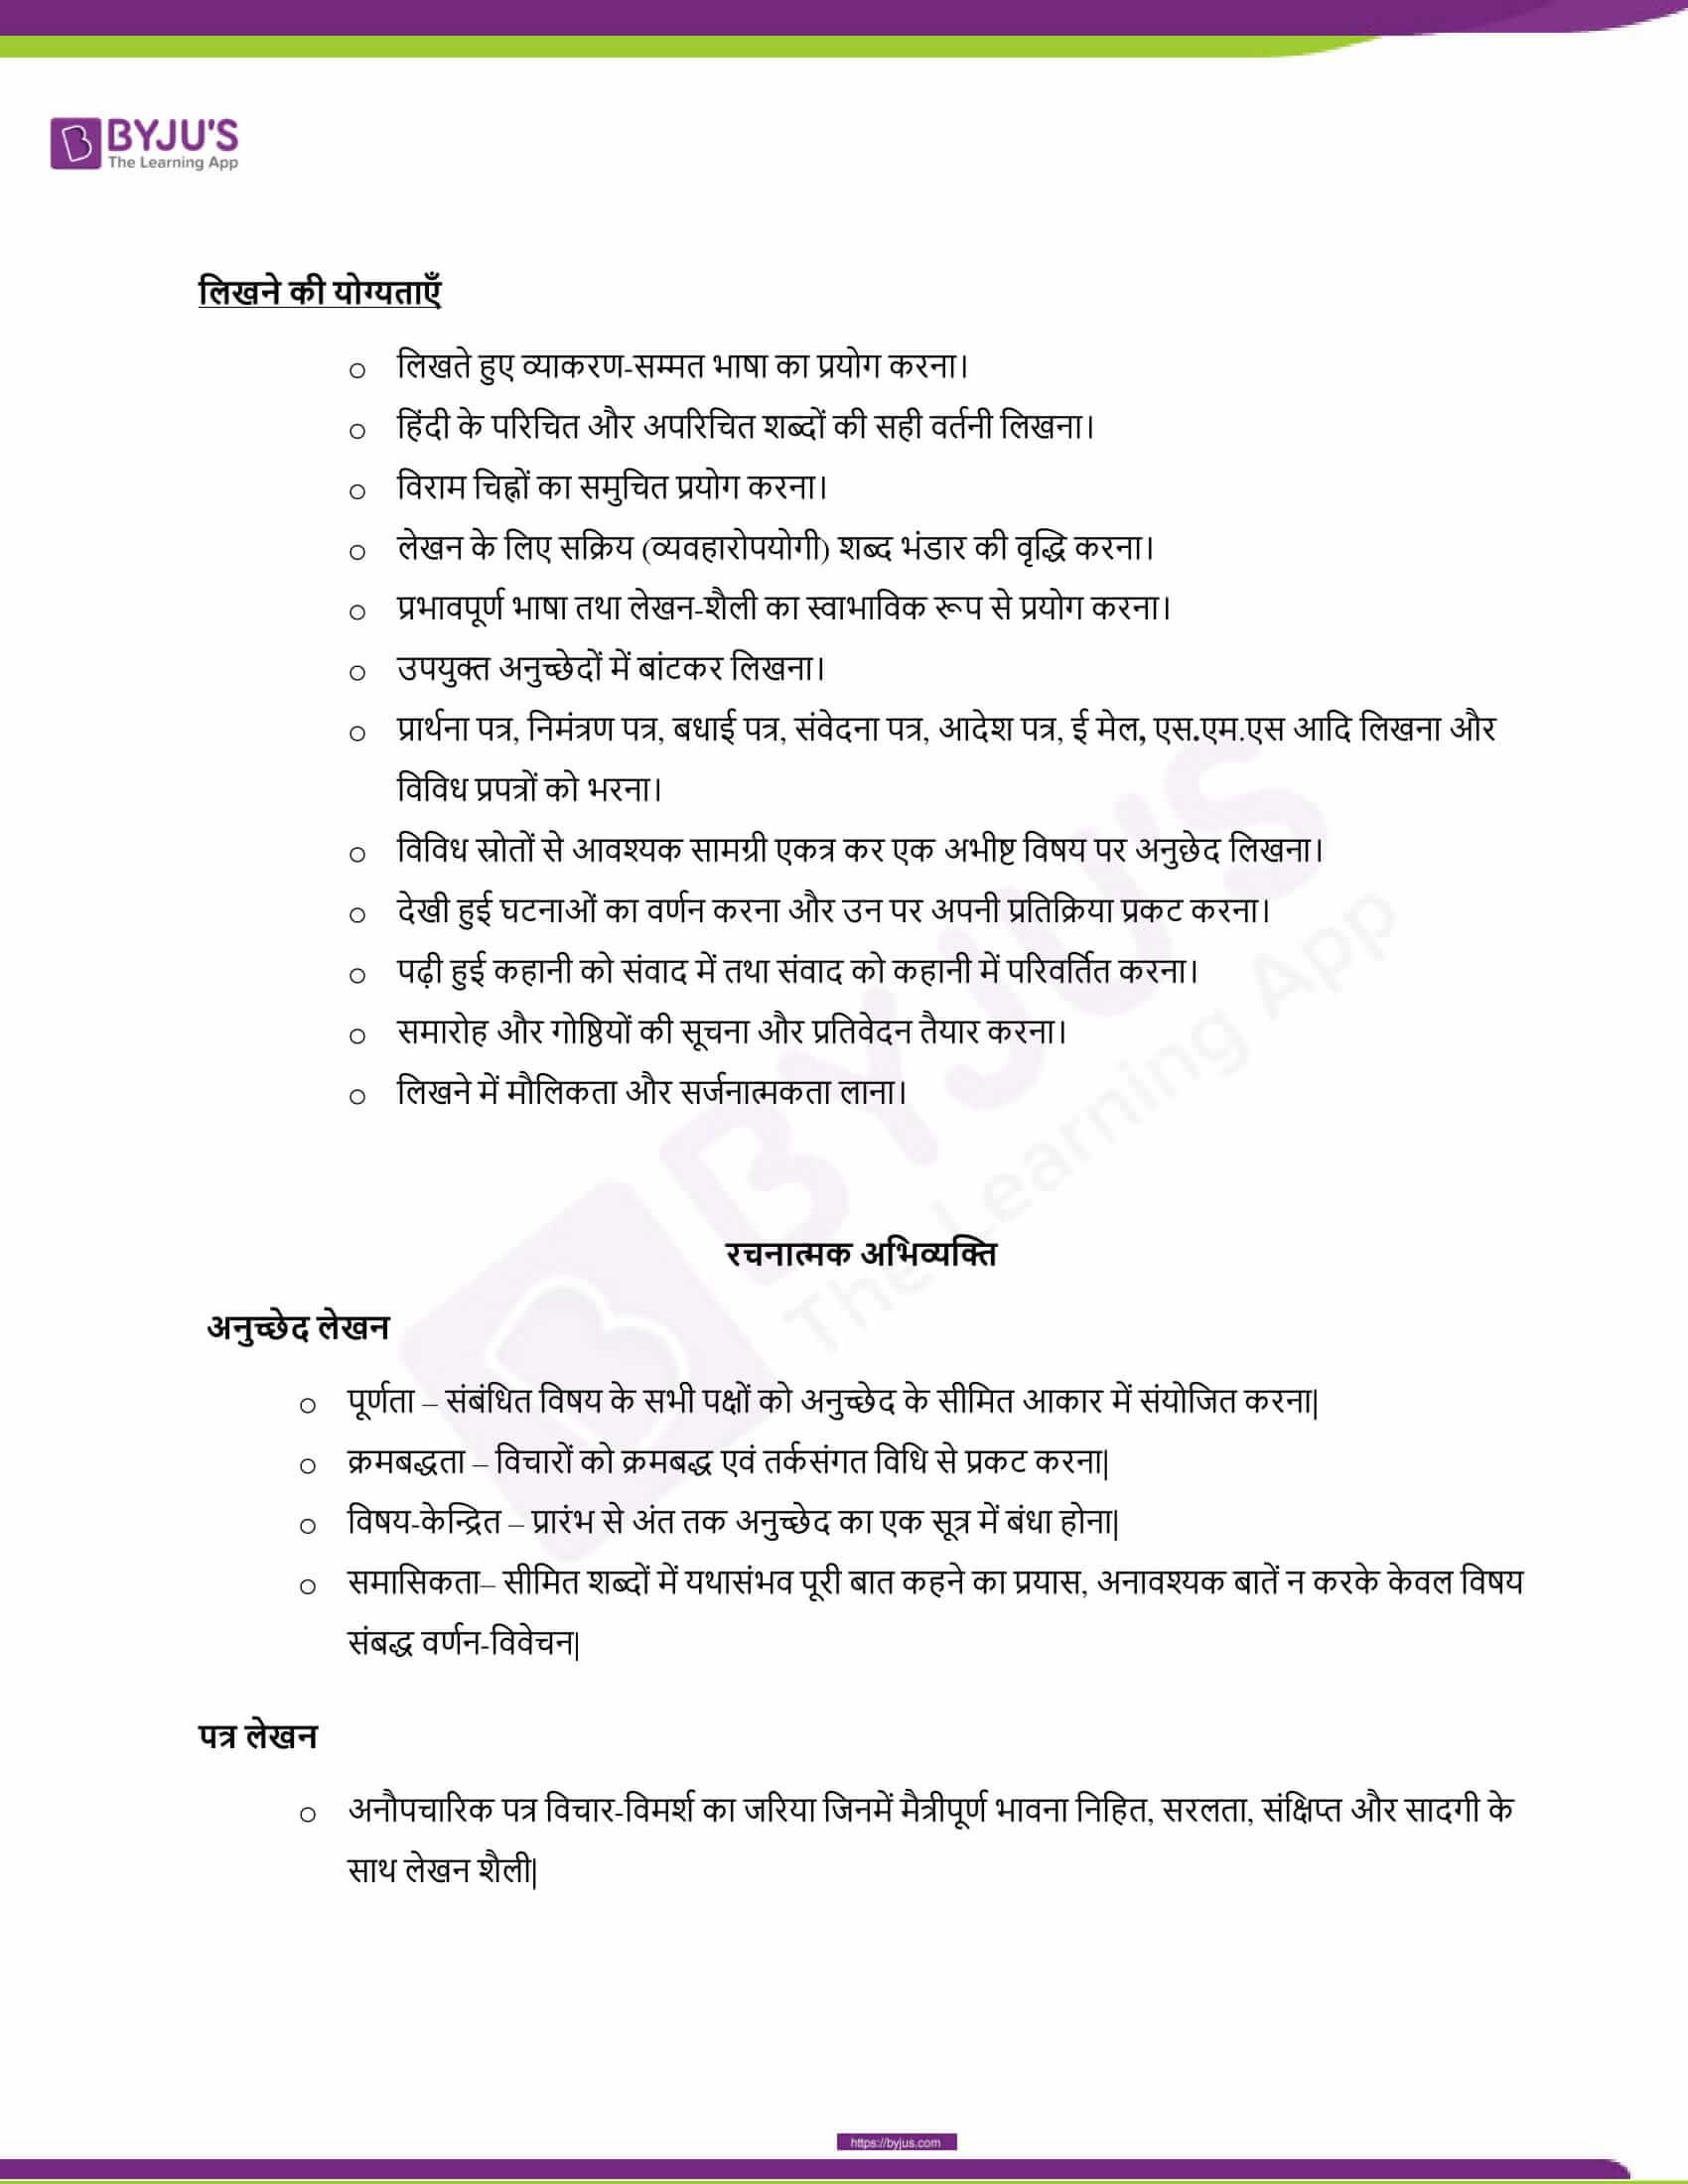 CBSE Class 10 Hindi Course B Revised Syllabus 2020 21 05